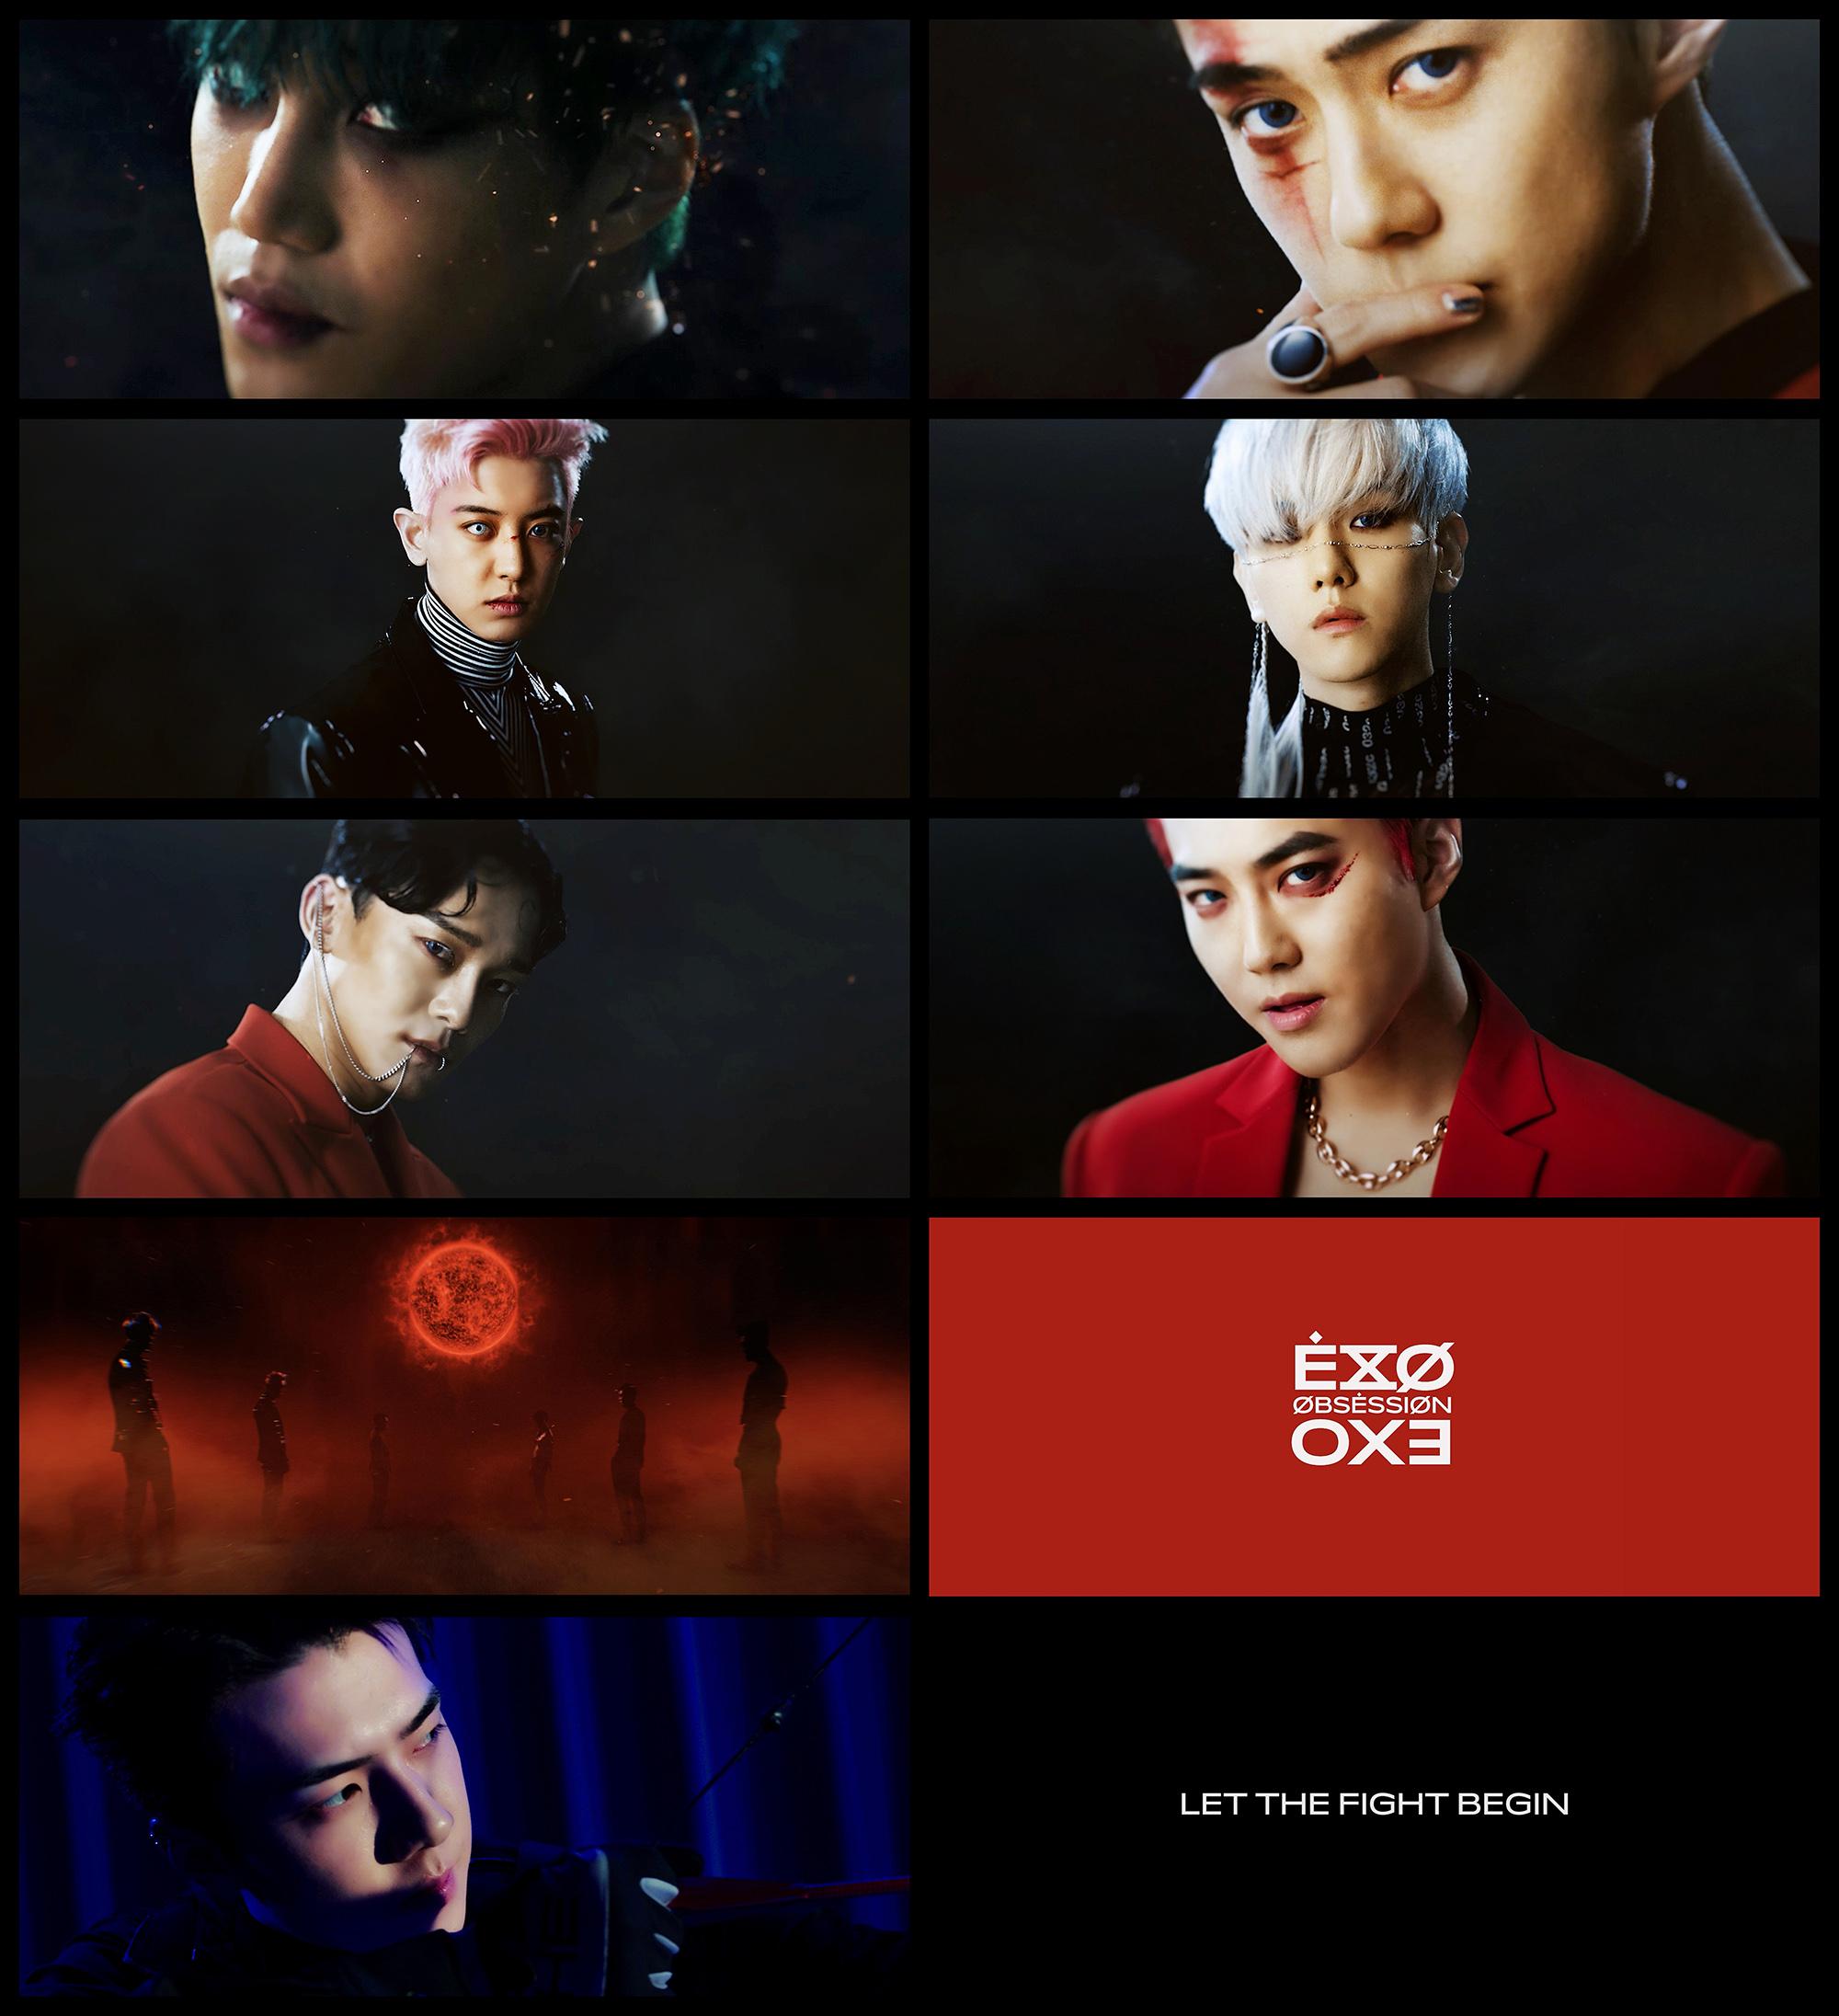 EXO VS X-EXO的對決!EXO正規6輯《OBSESSION》進入回歸倒計時